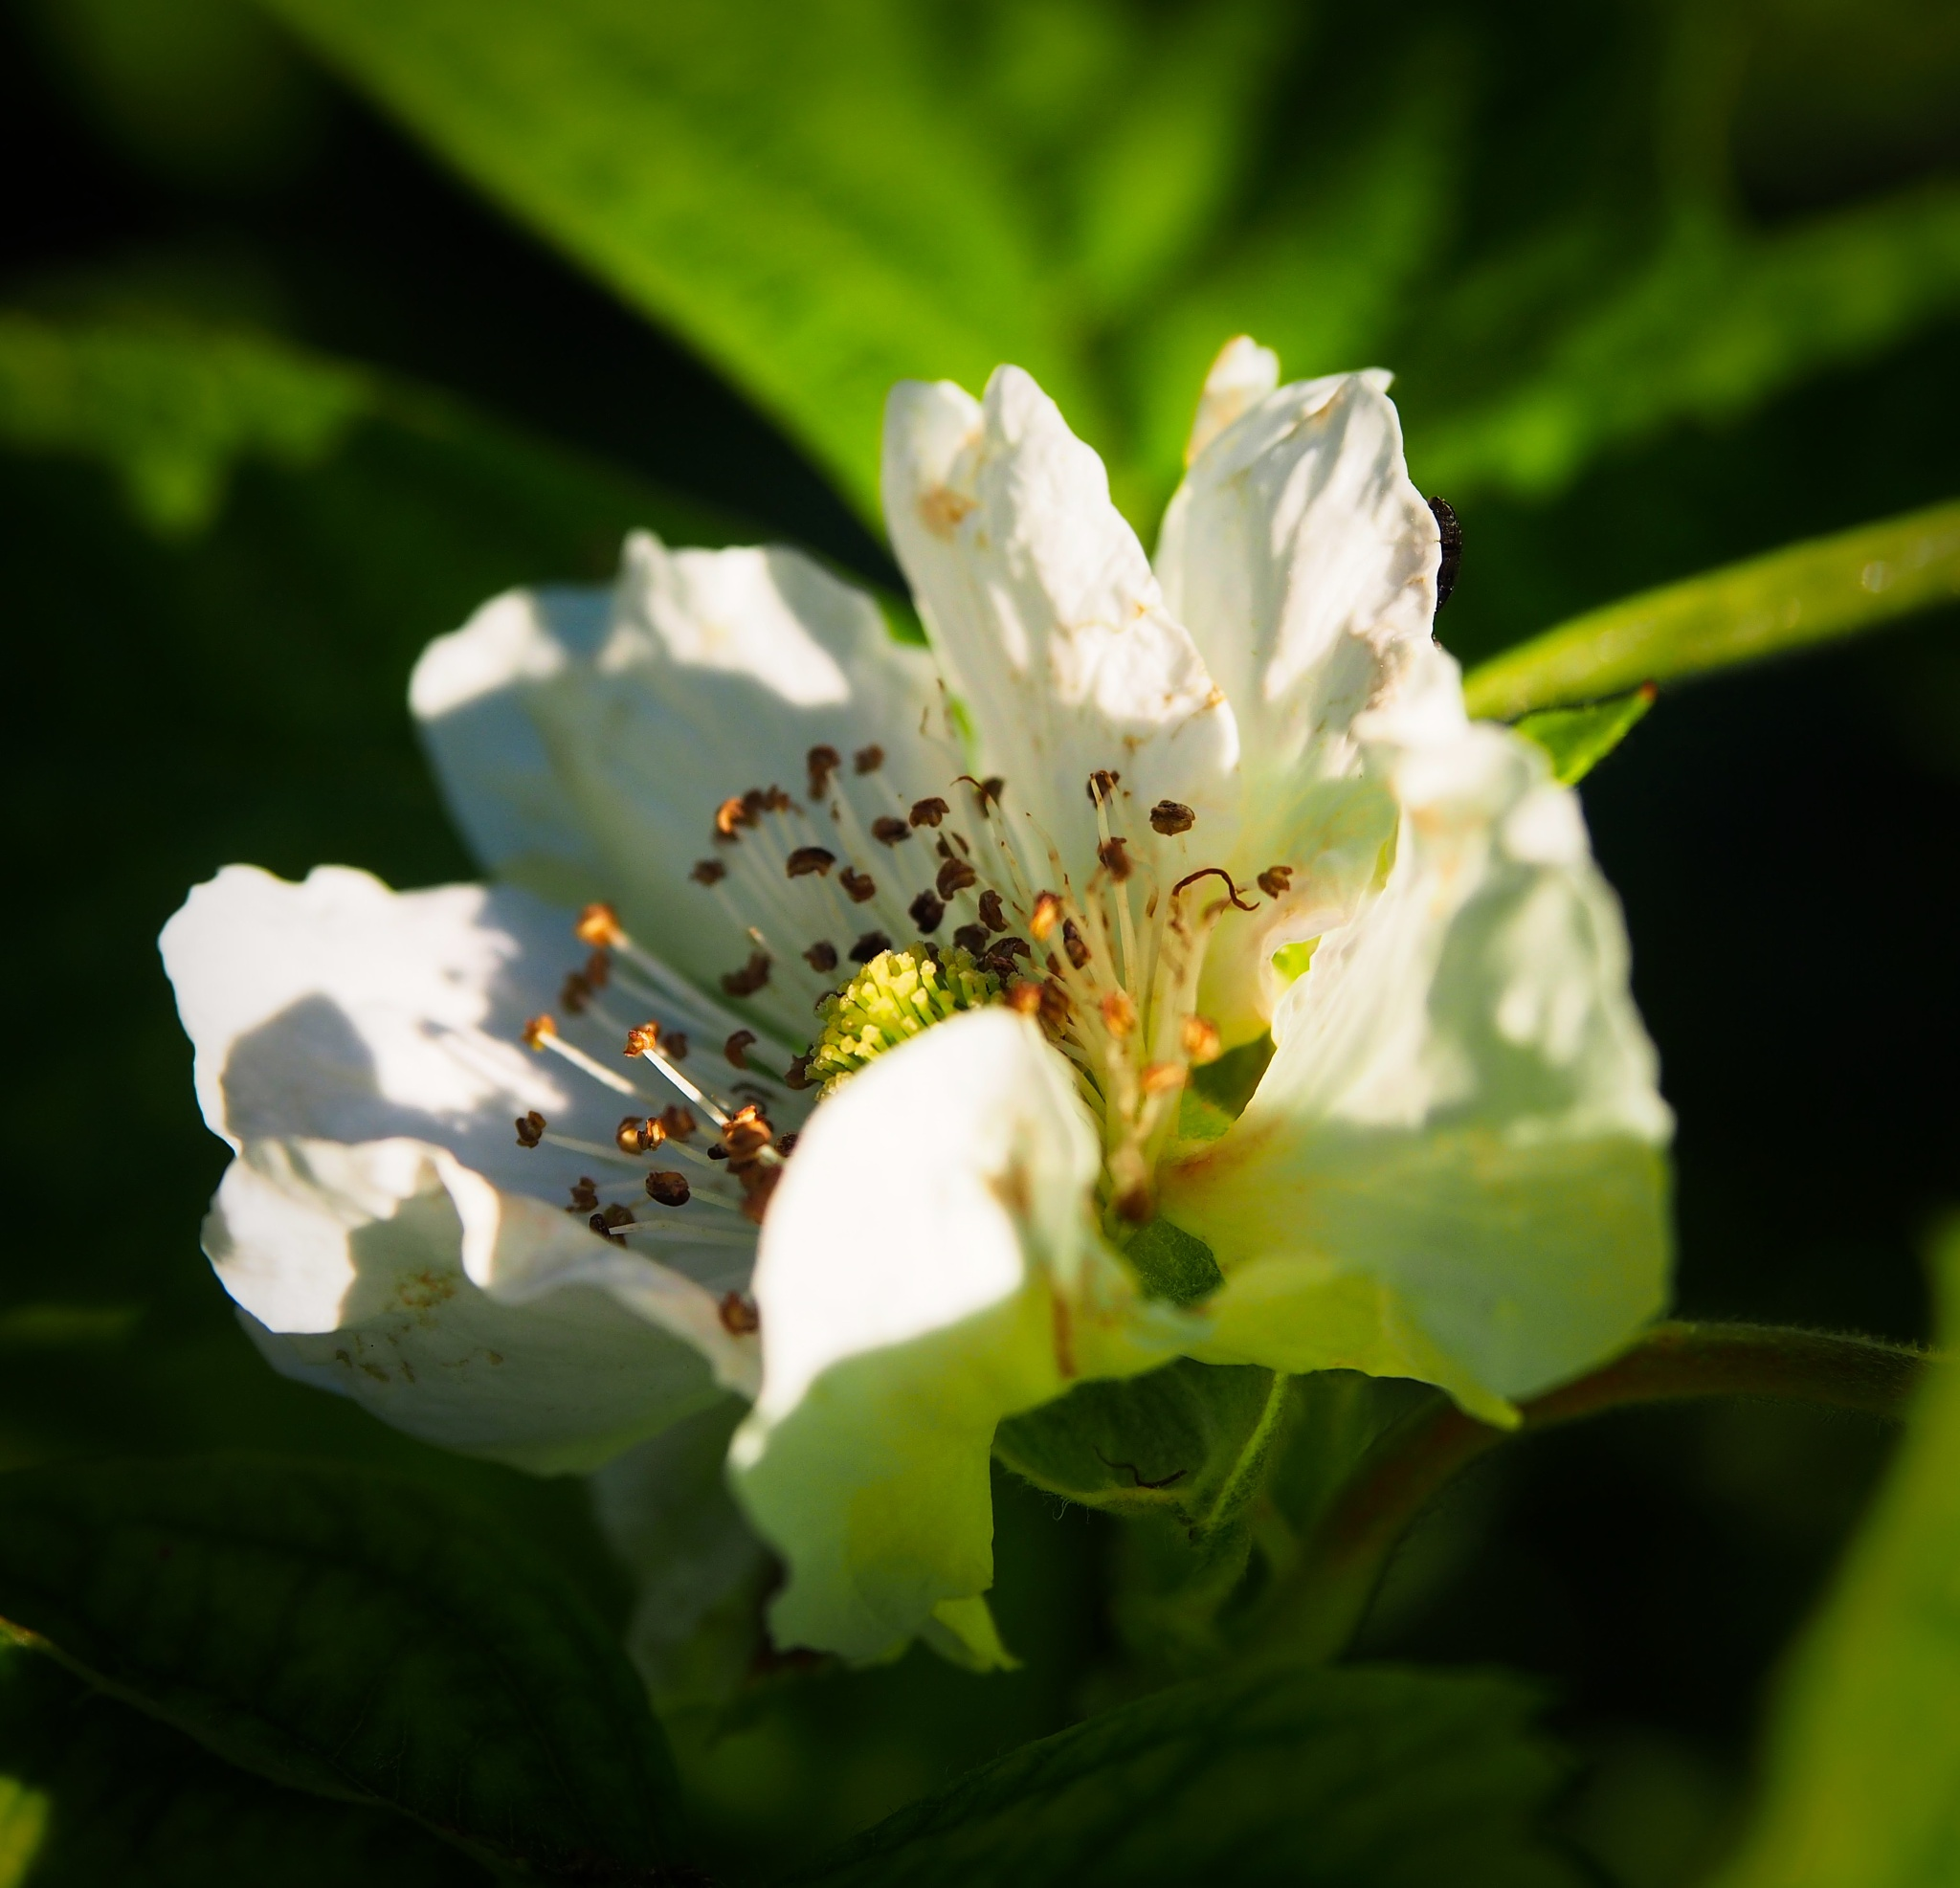 blackberry blossom by tancon